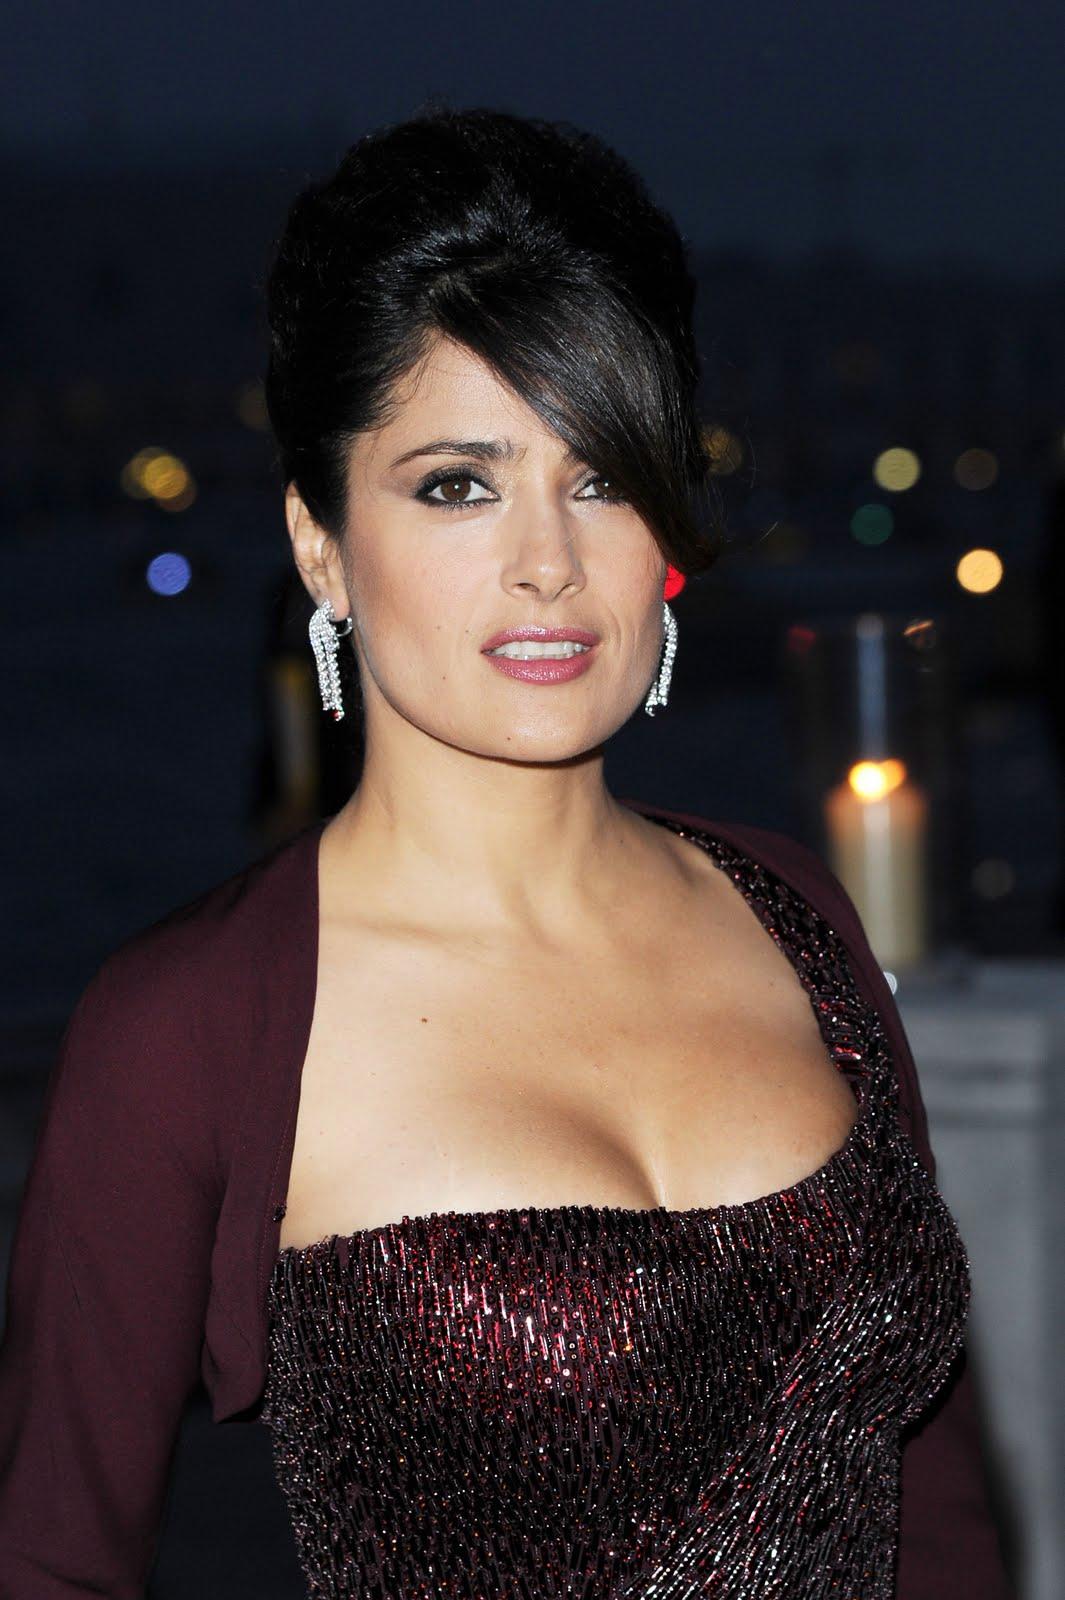 http://4.bp.blogspot.com/-CX1YYiRr4X0/Tl9hSgaQAOI/AAAAAAAAAbU/y9P2NJHtMjk/s1600/Salma-Hayek-pics-images-photos-pictures-videos-Actress-movies+%252813%2529.jpg